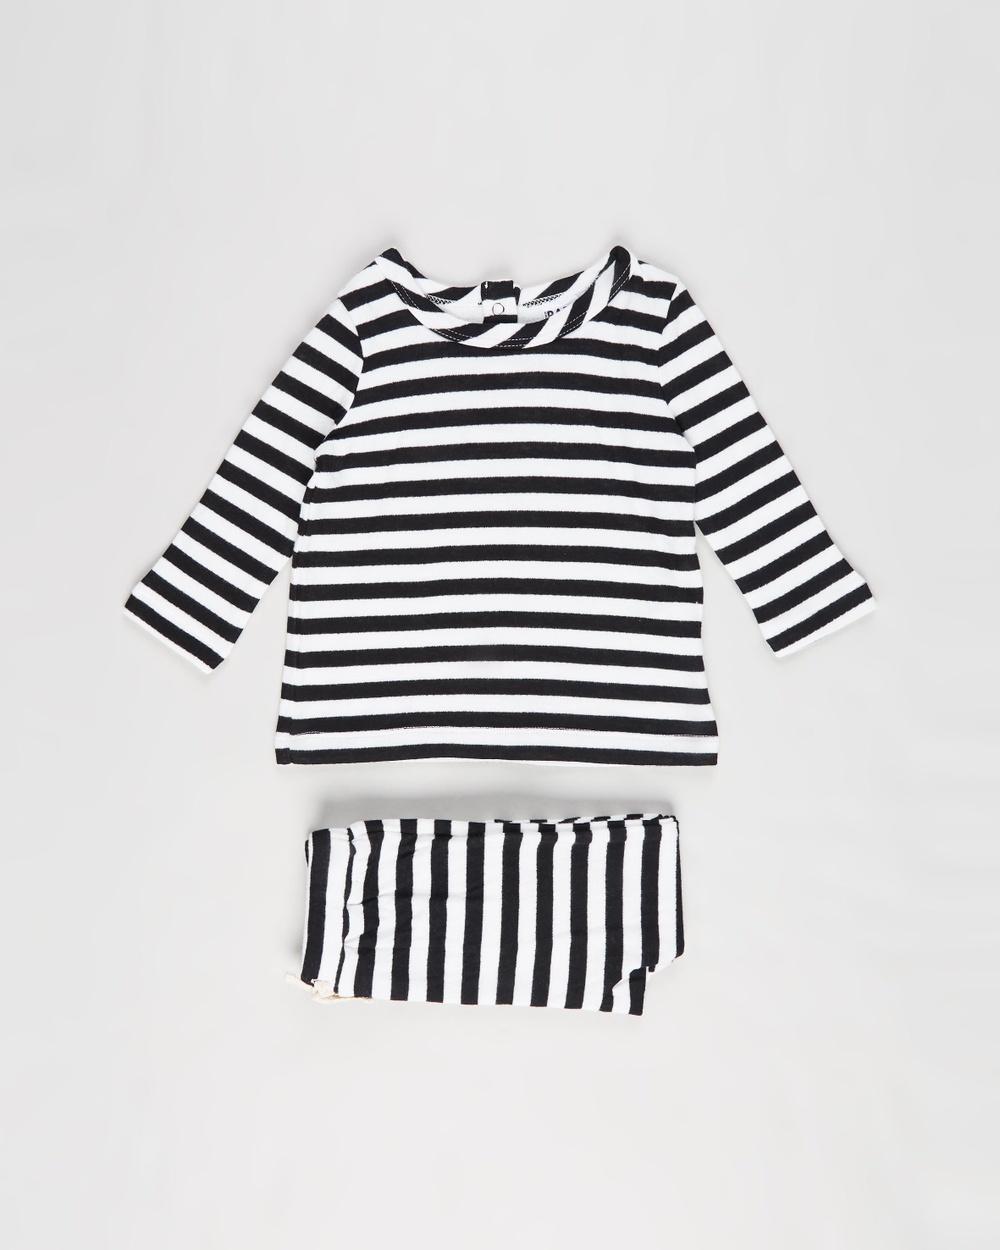 Cotton On Baby Lenny Johnny Set Babies Sweatpants Hannah Stripe Black & White Australia